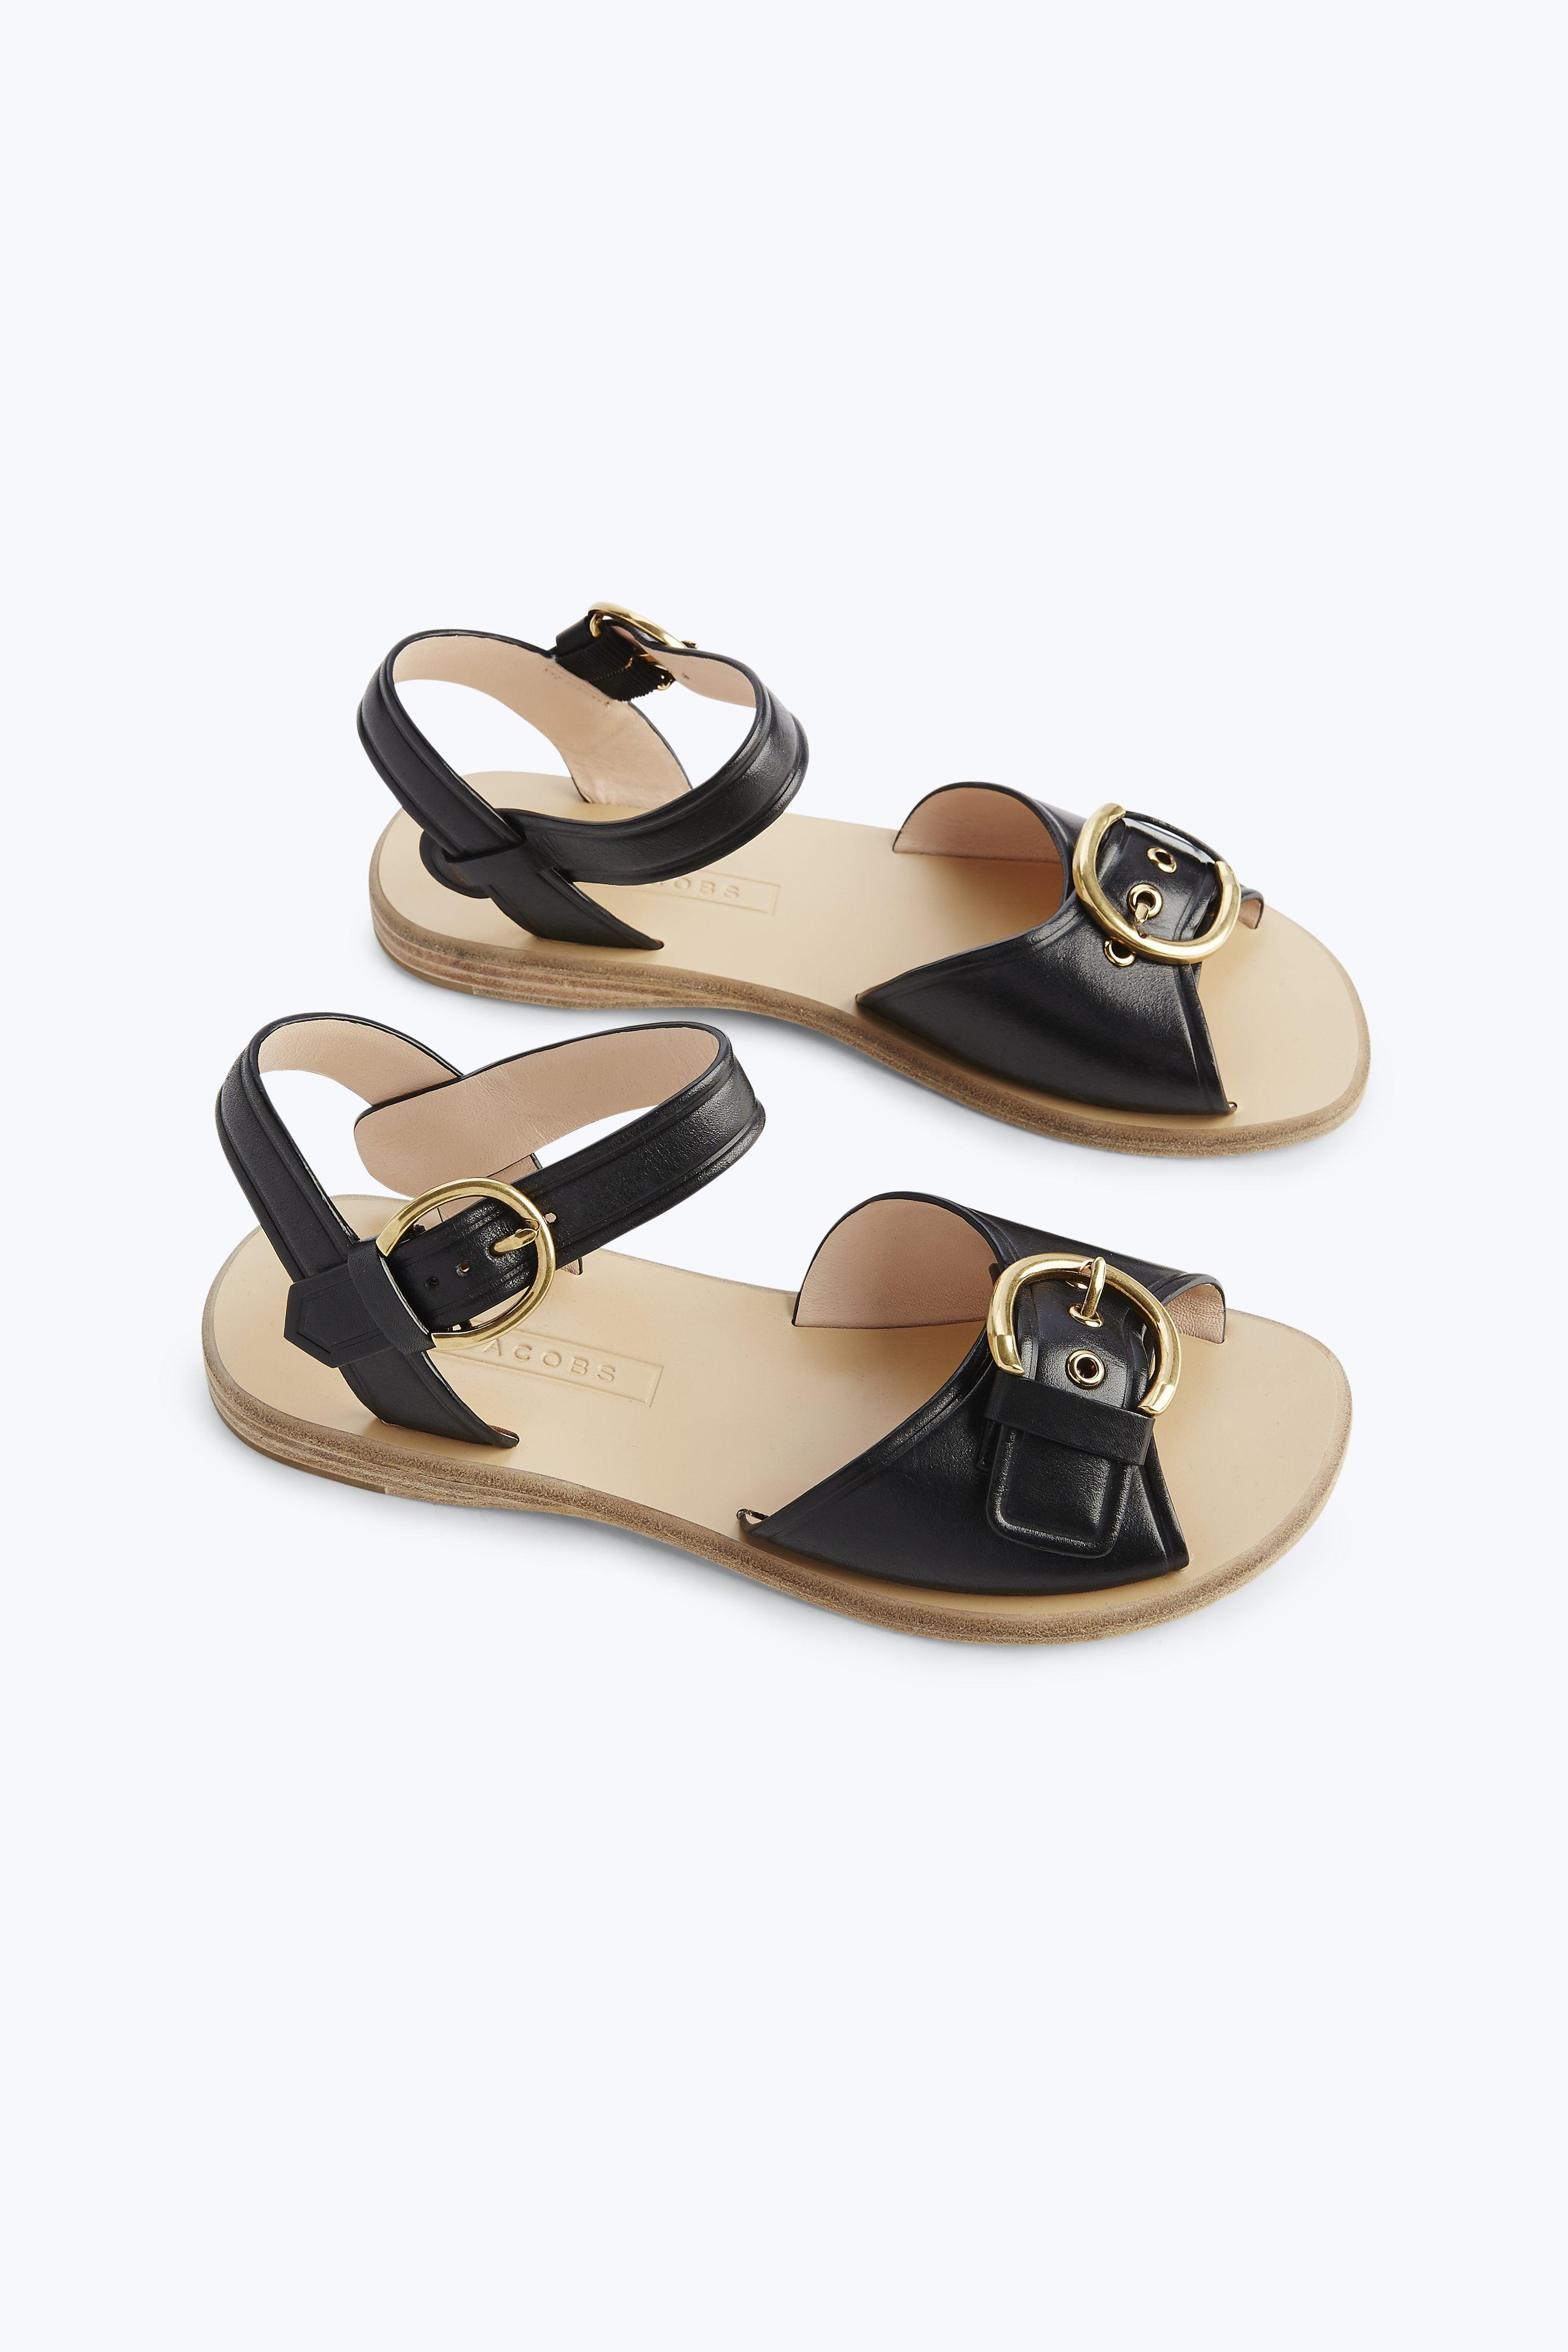 Marc Jacobs Horizon Flat Leather Sandal wMMGtJm